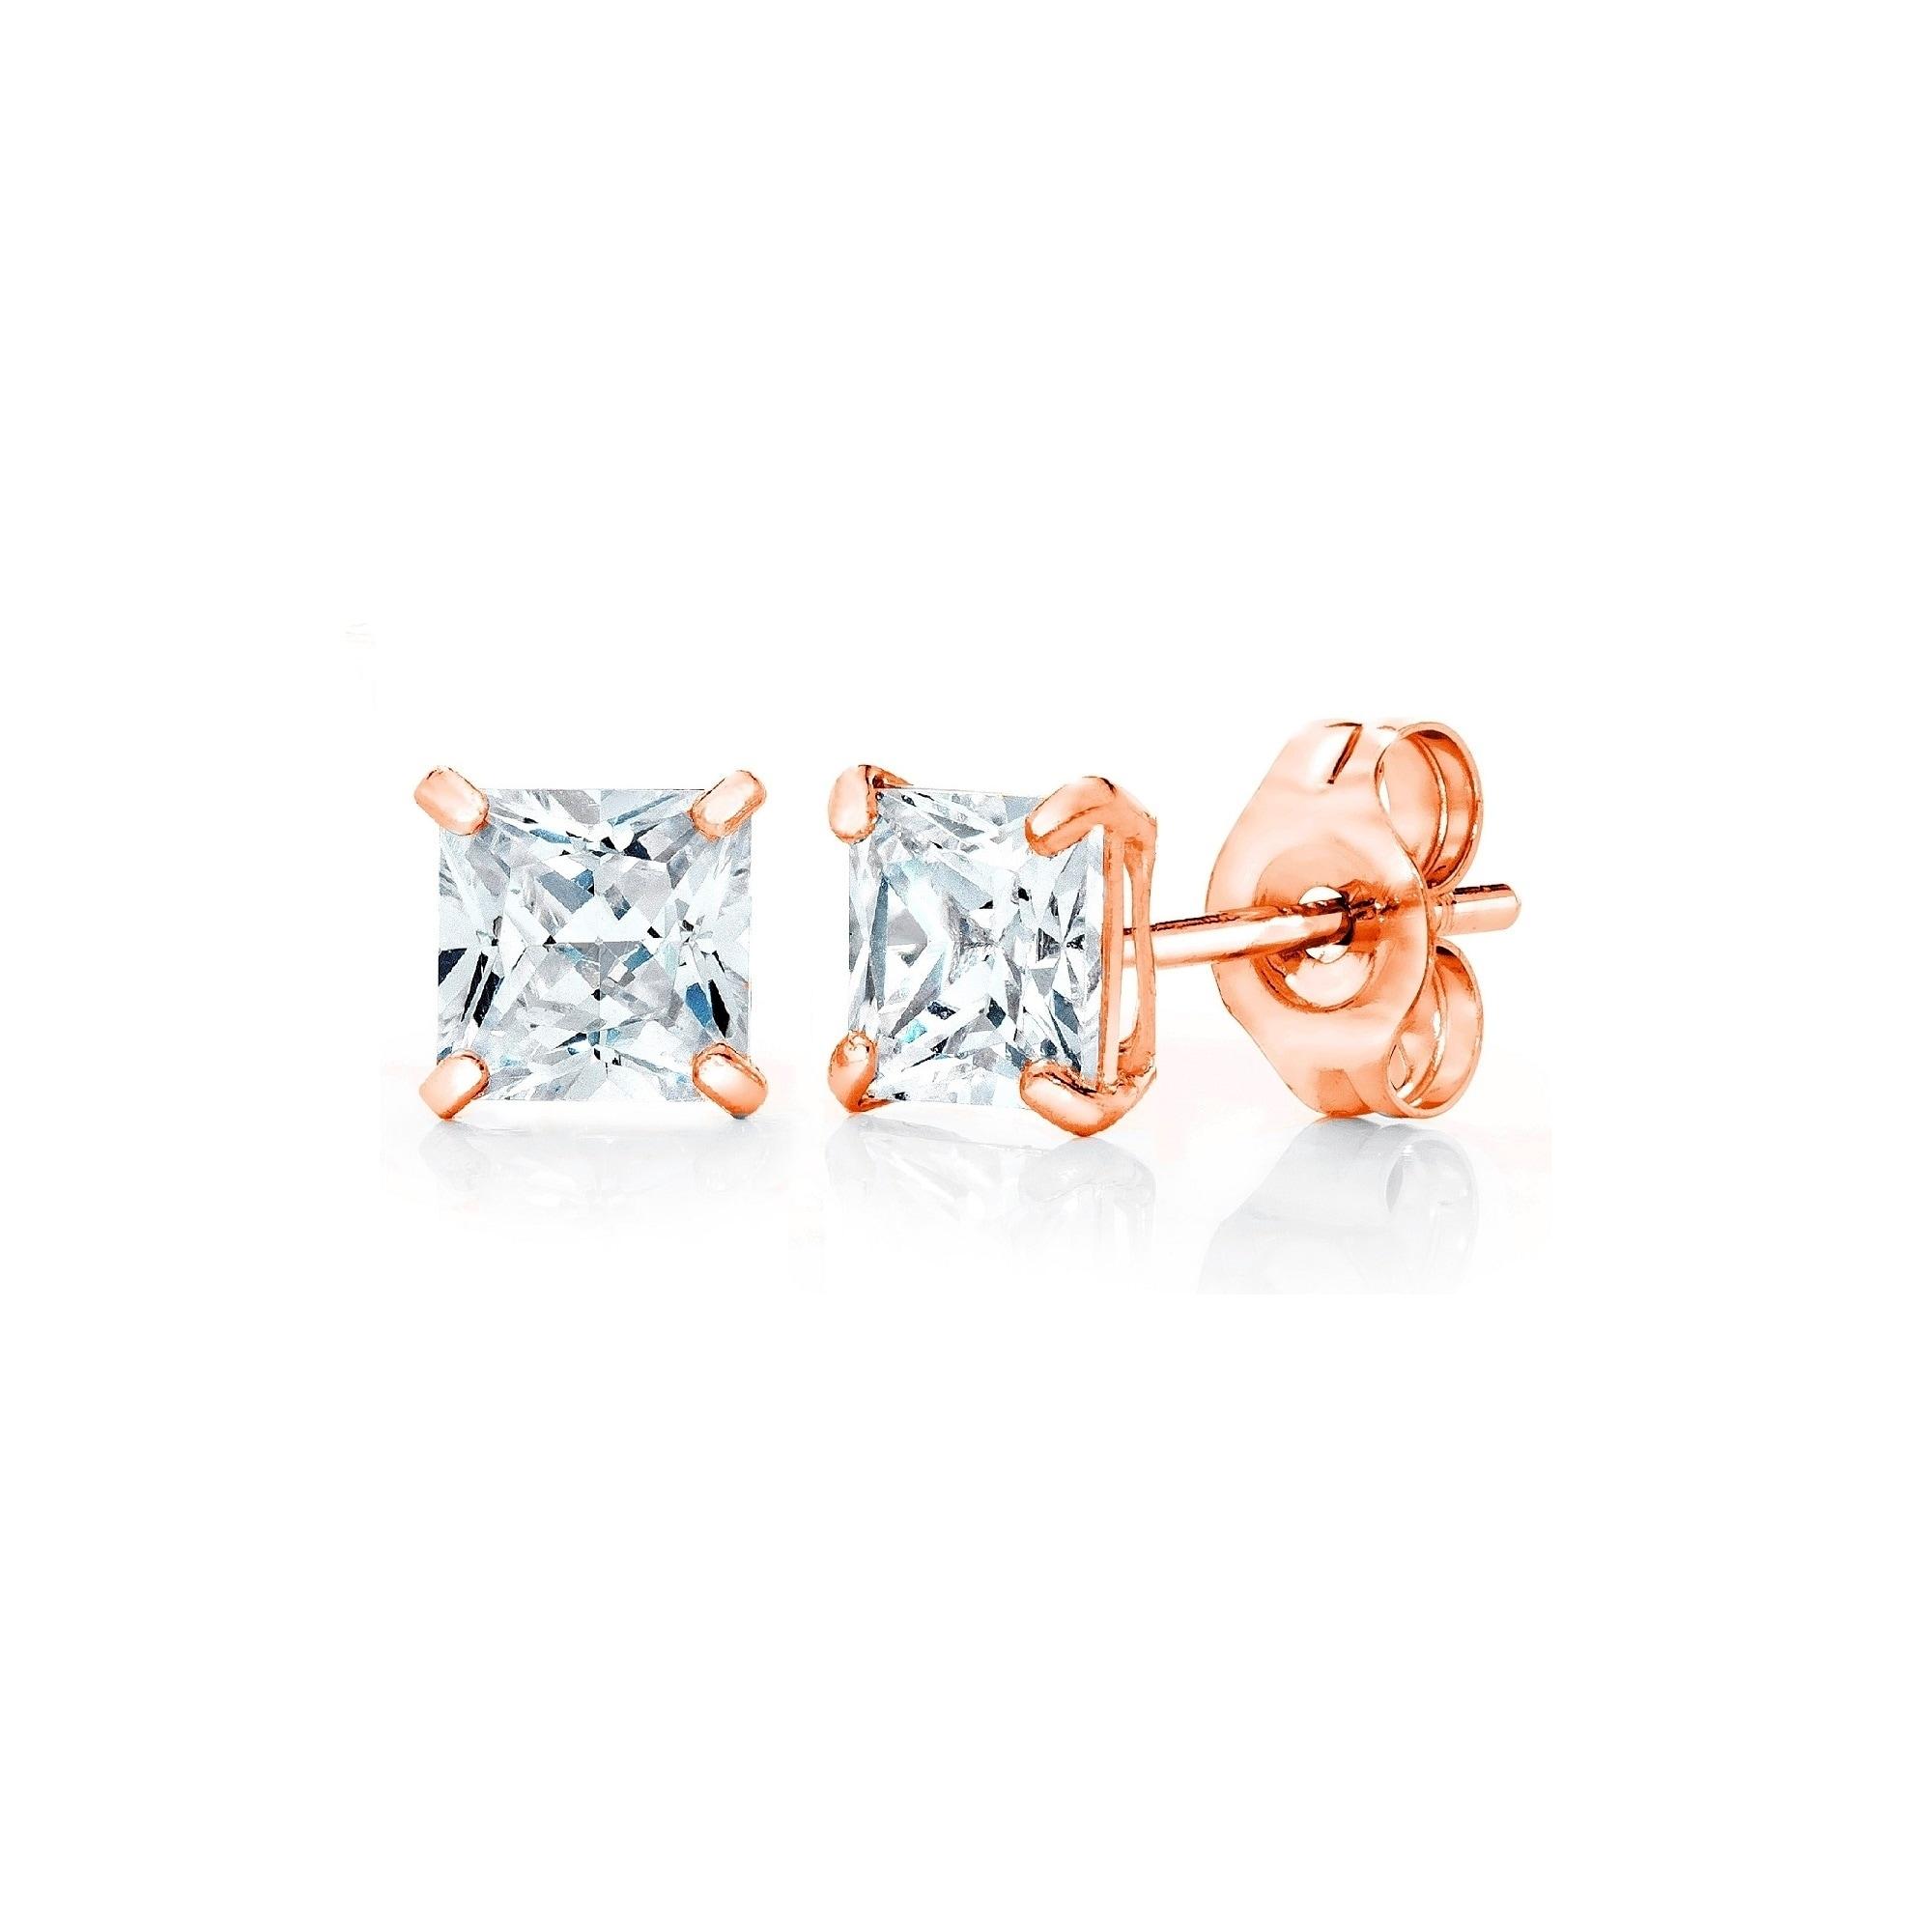 Pori Jewelers 14K Gold 3MM Princess-Cut Stud Earrings wCrystal by ...